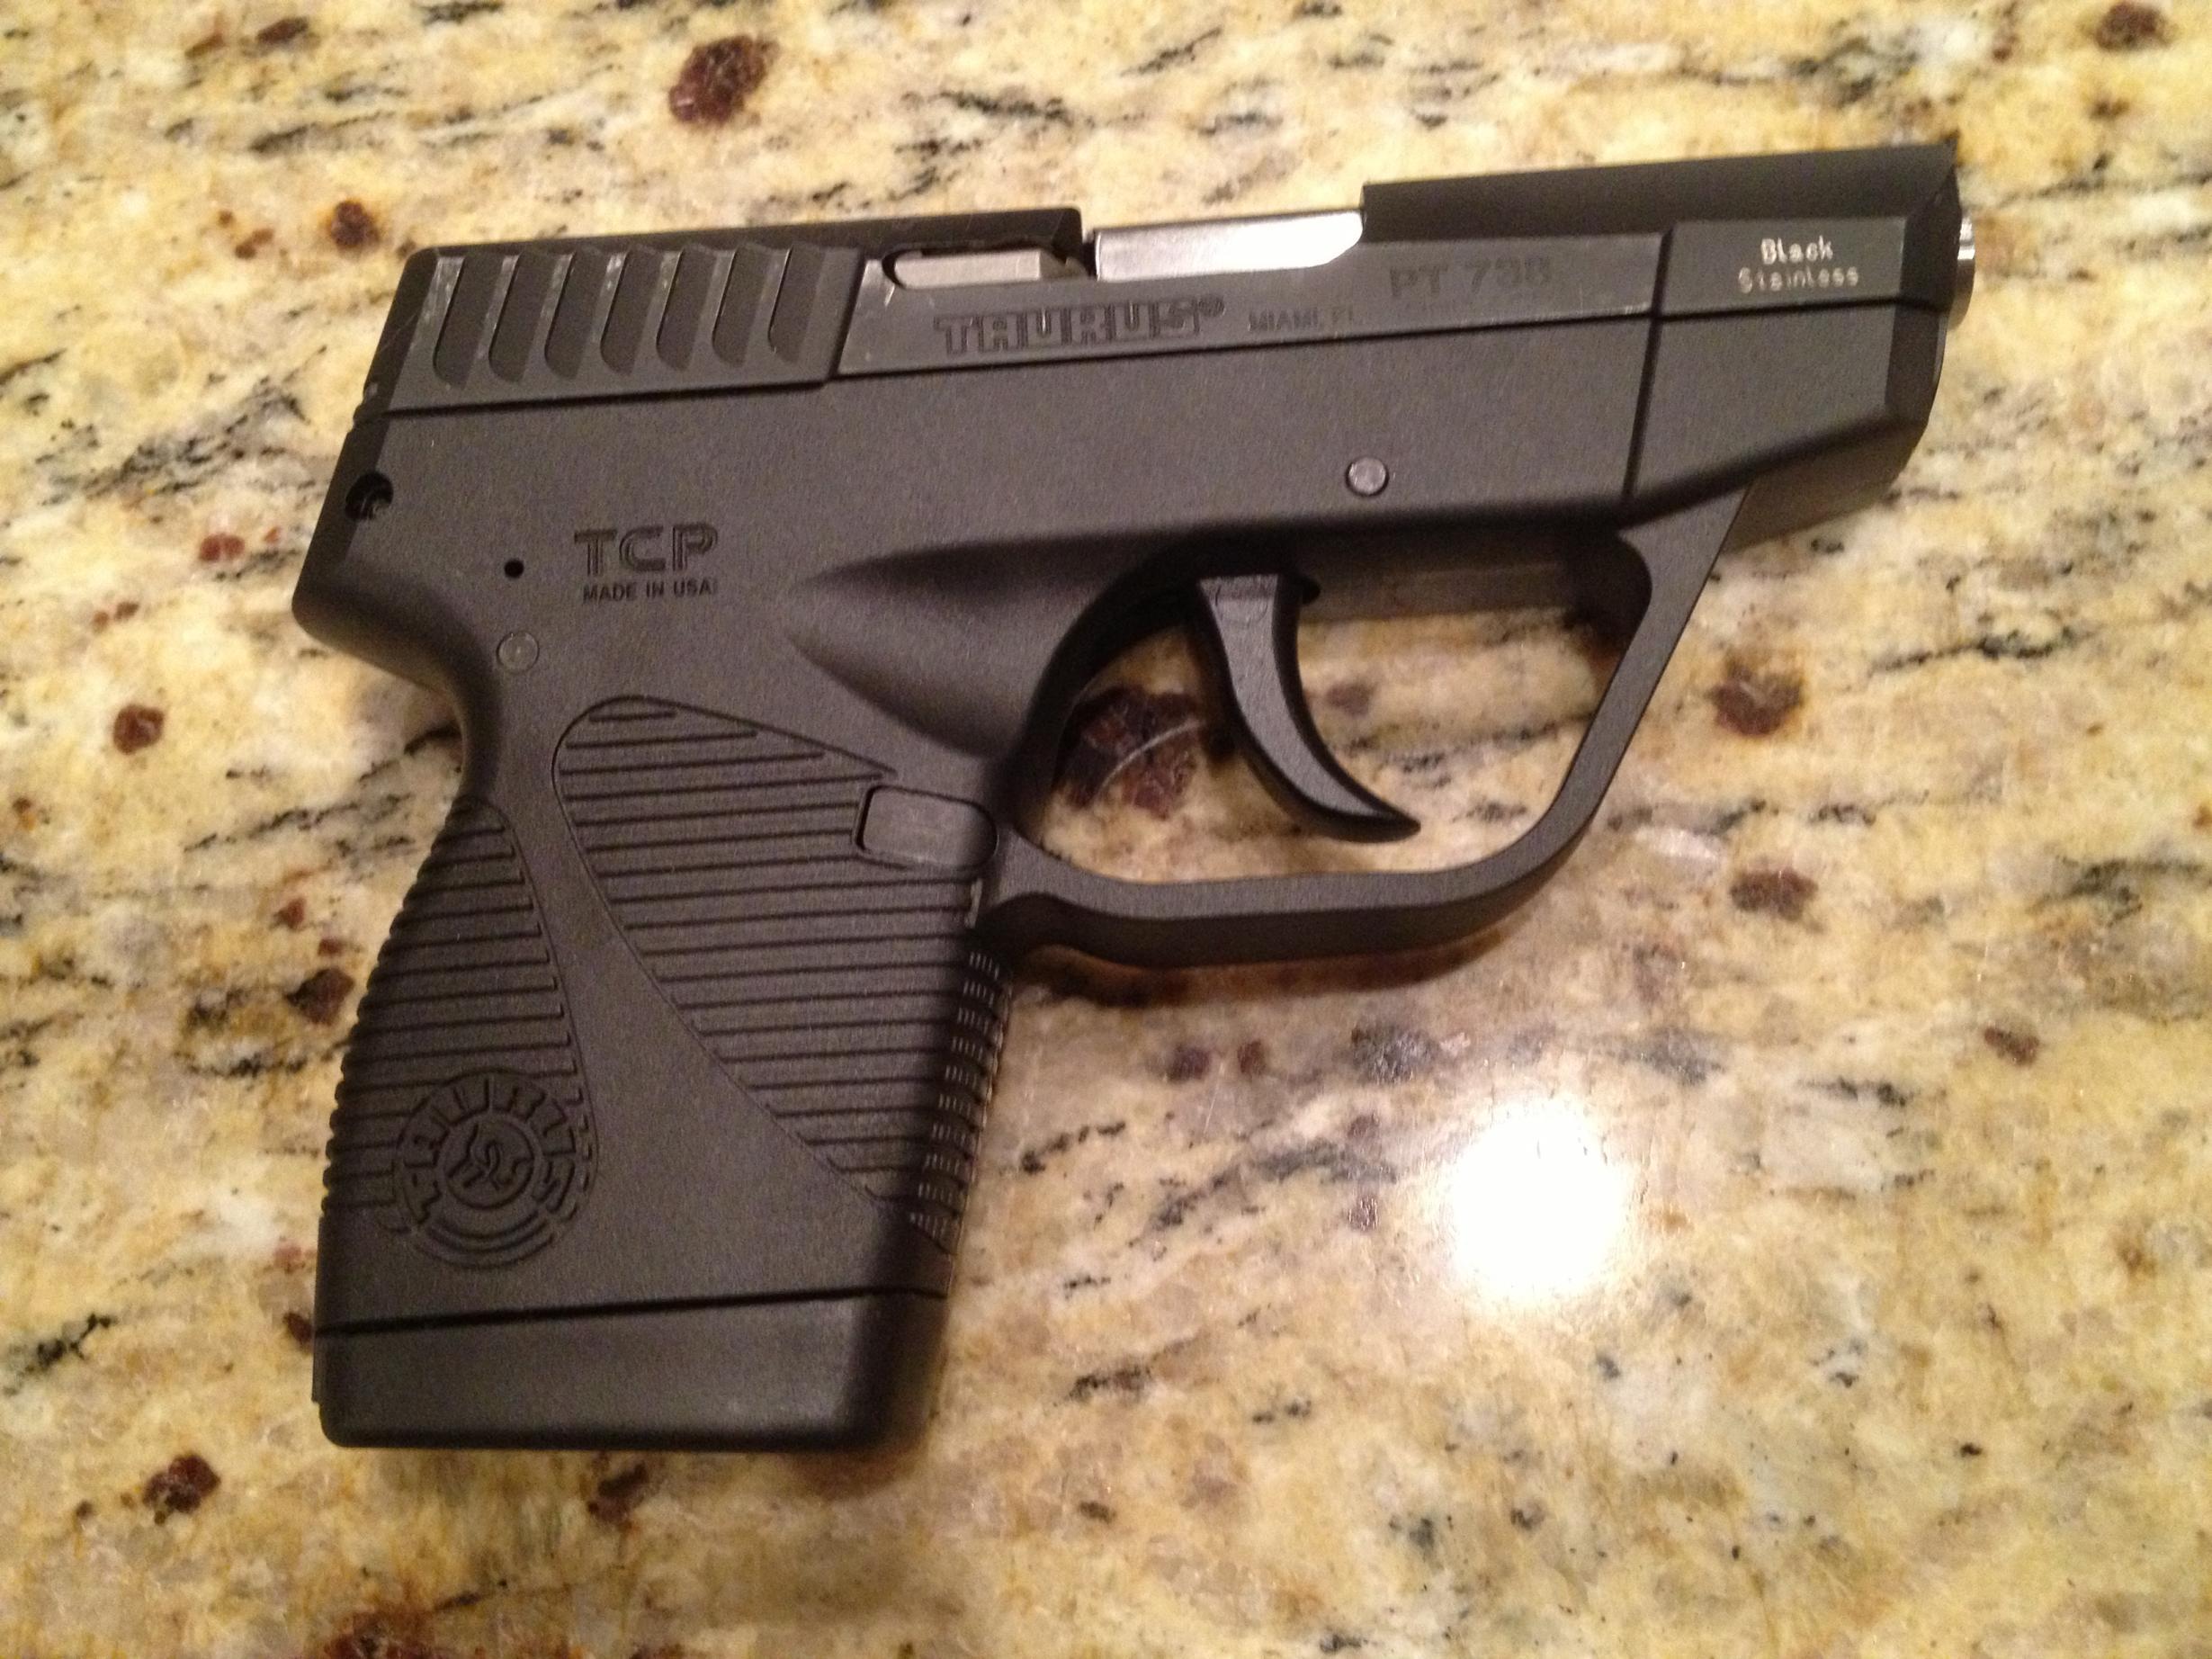 New Pocket Gun and Range Report-img_0579.jpg